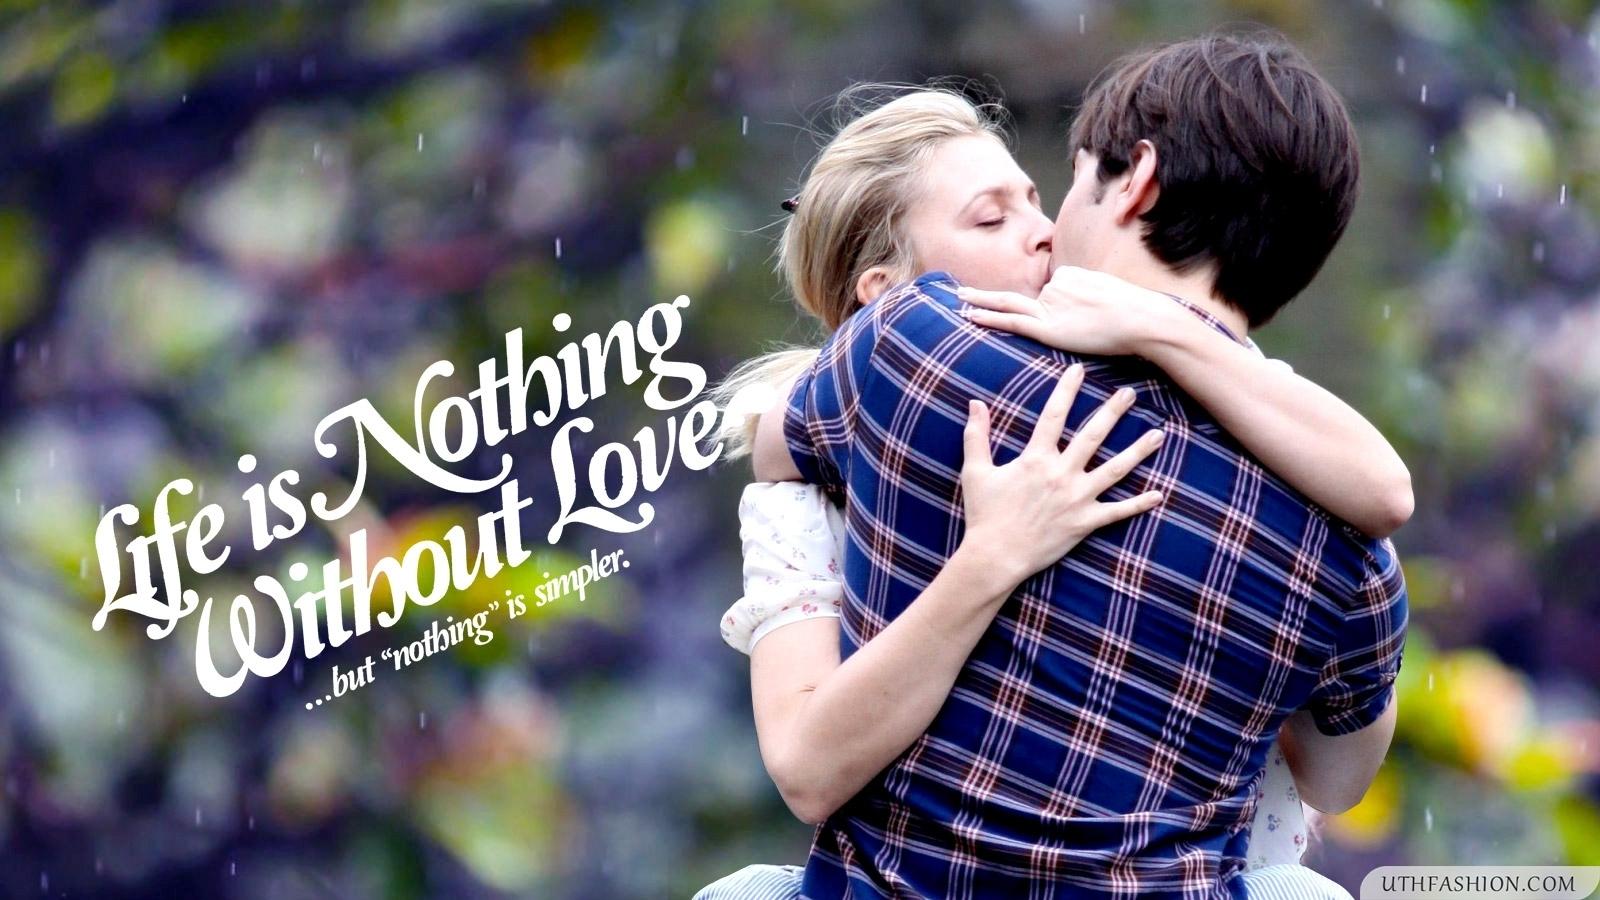 9191 kiss love wallpaper free download | 1600 x 900